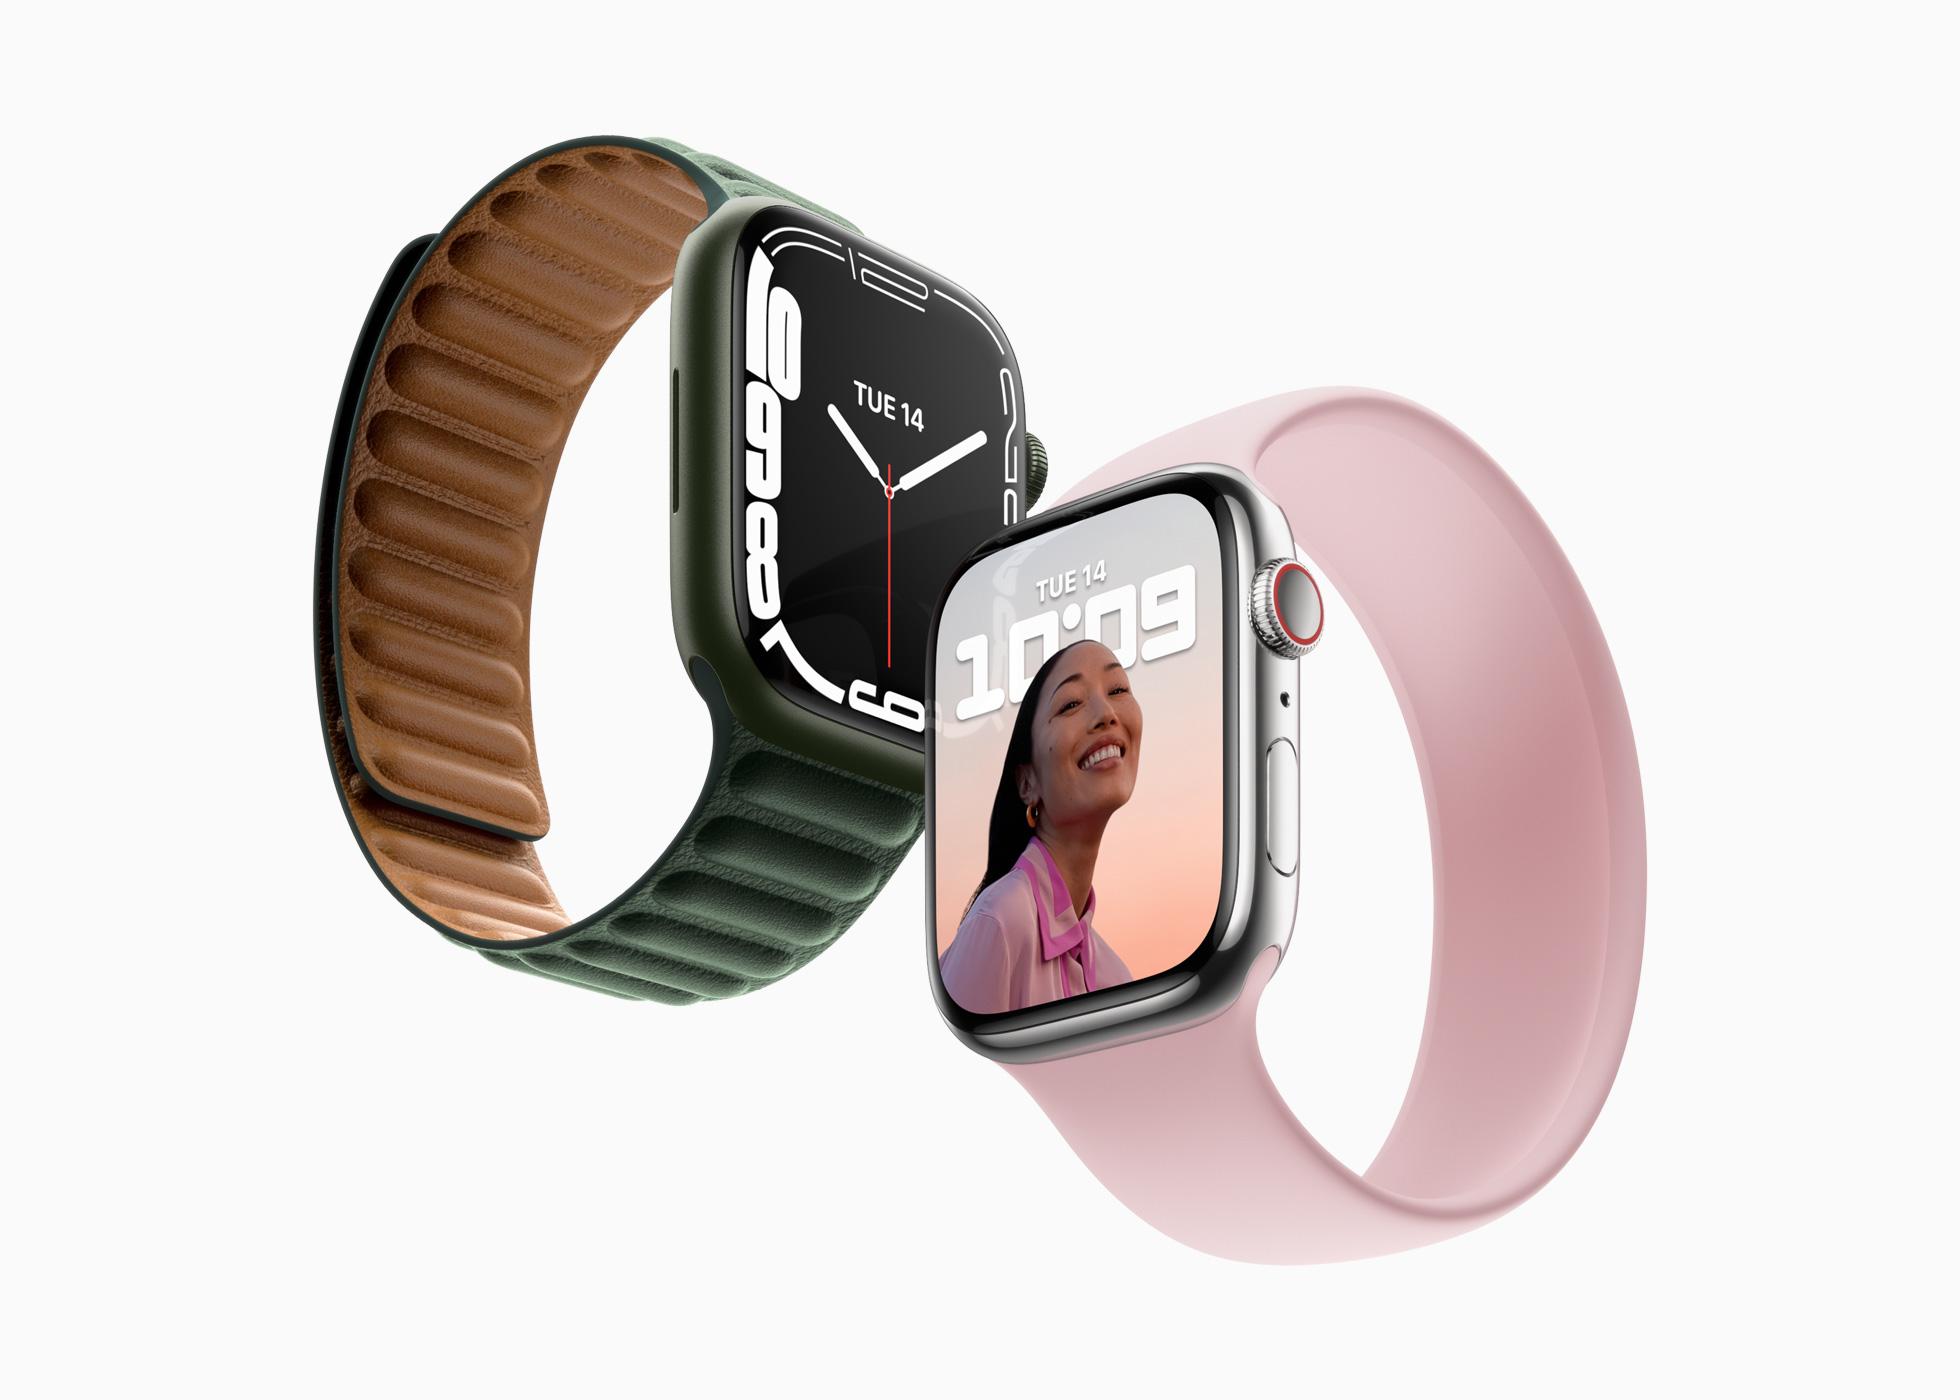 「Apple Watch Series 7」新登場!ディスプレイは過去最大、自転車ユーザー向け新機能も